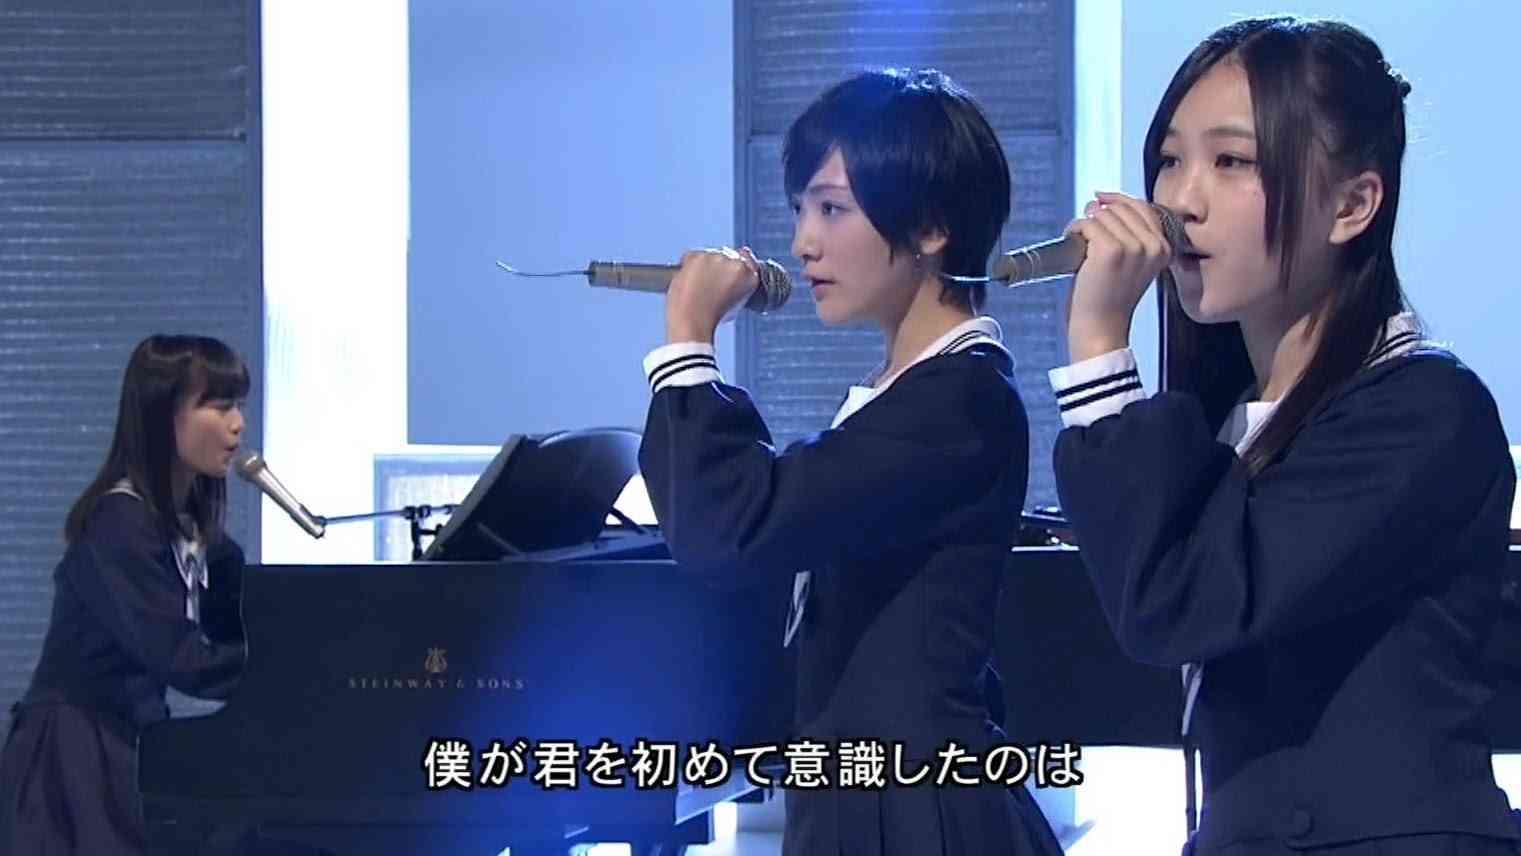 [HD] 乃木坂46 - 君の名は希望 LIVE 生歌&生田絵梨花ピアノ生演奏 / Nogizaka46 - Kimi no Na wa Kibo - YouTube